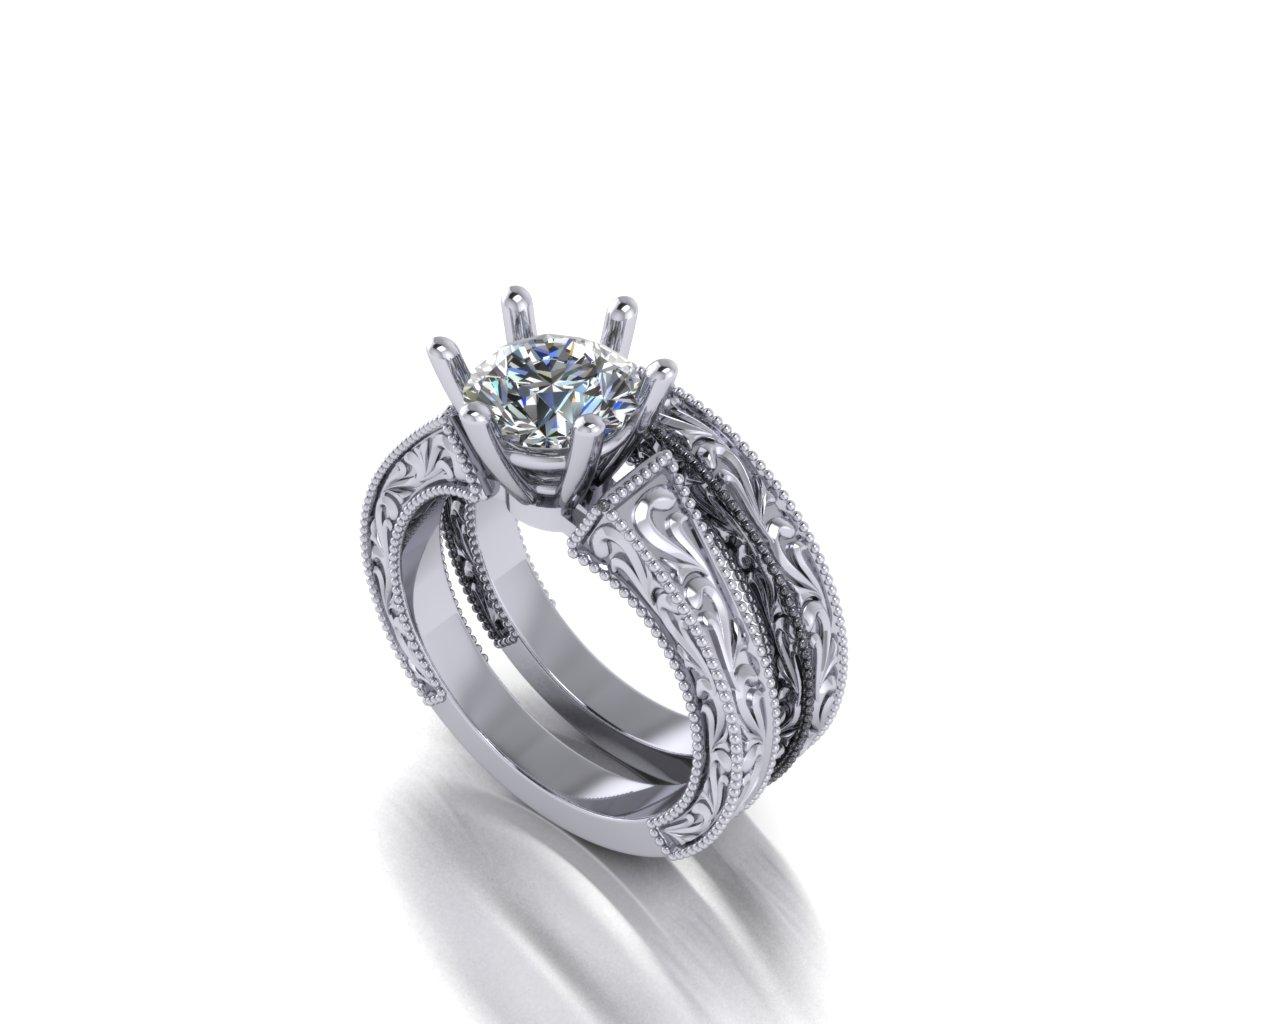 elite fine jewelry crafting richardson texas tx